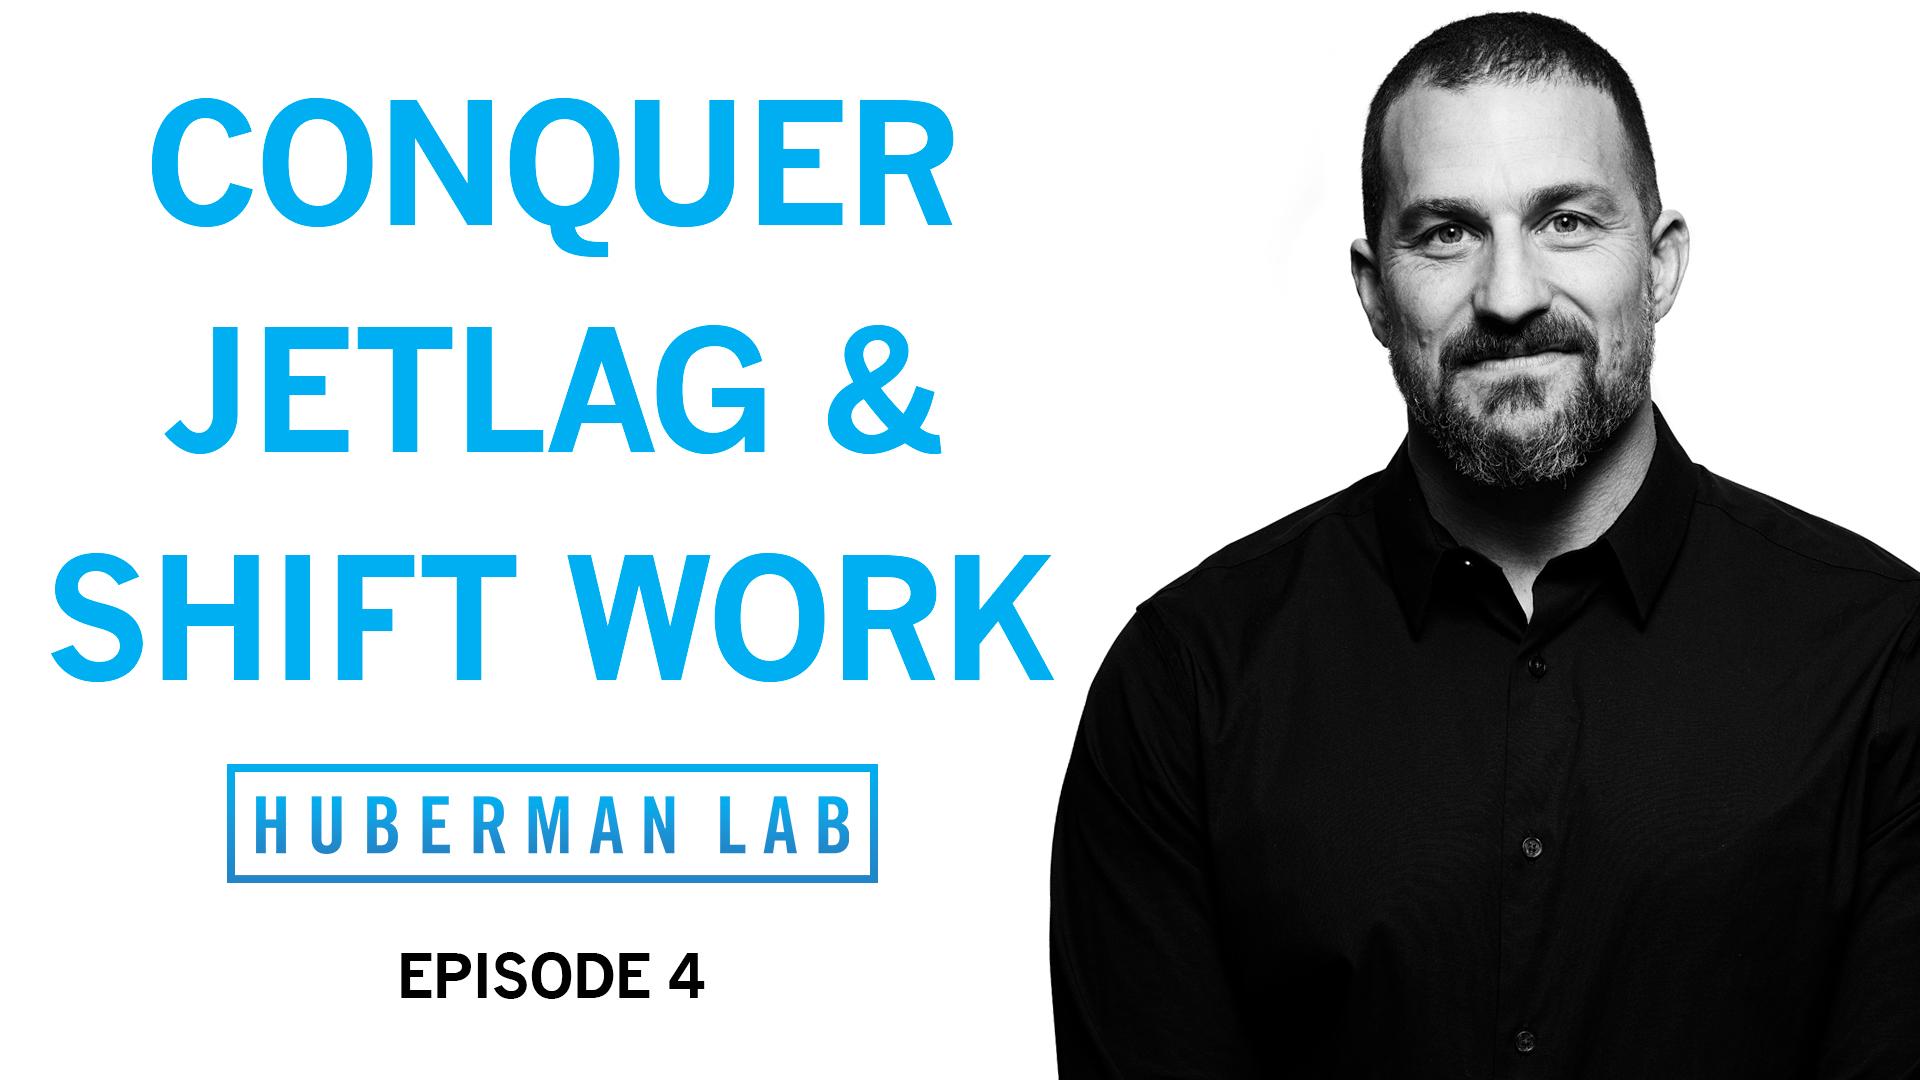 Huberman Lab Podcast Episode 4 Title Card